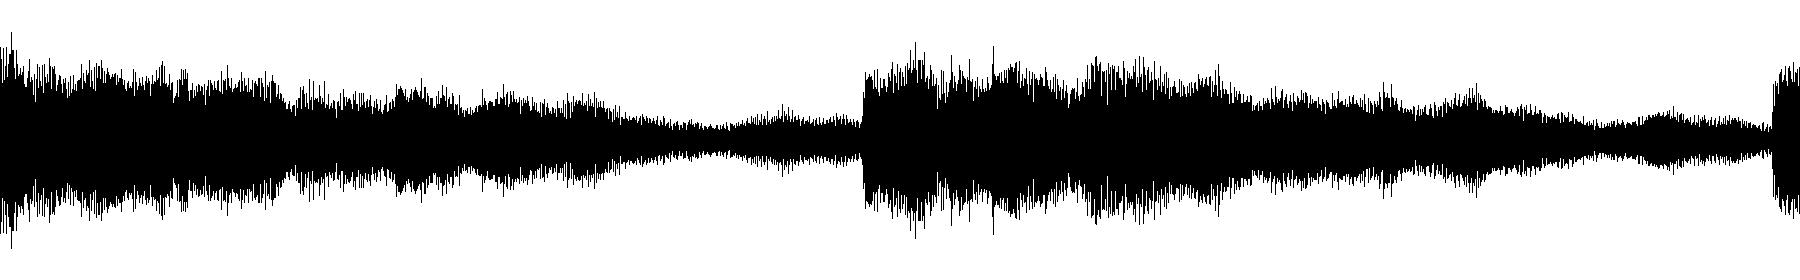 95 c ep stillsonice 02